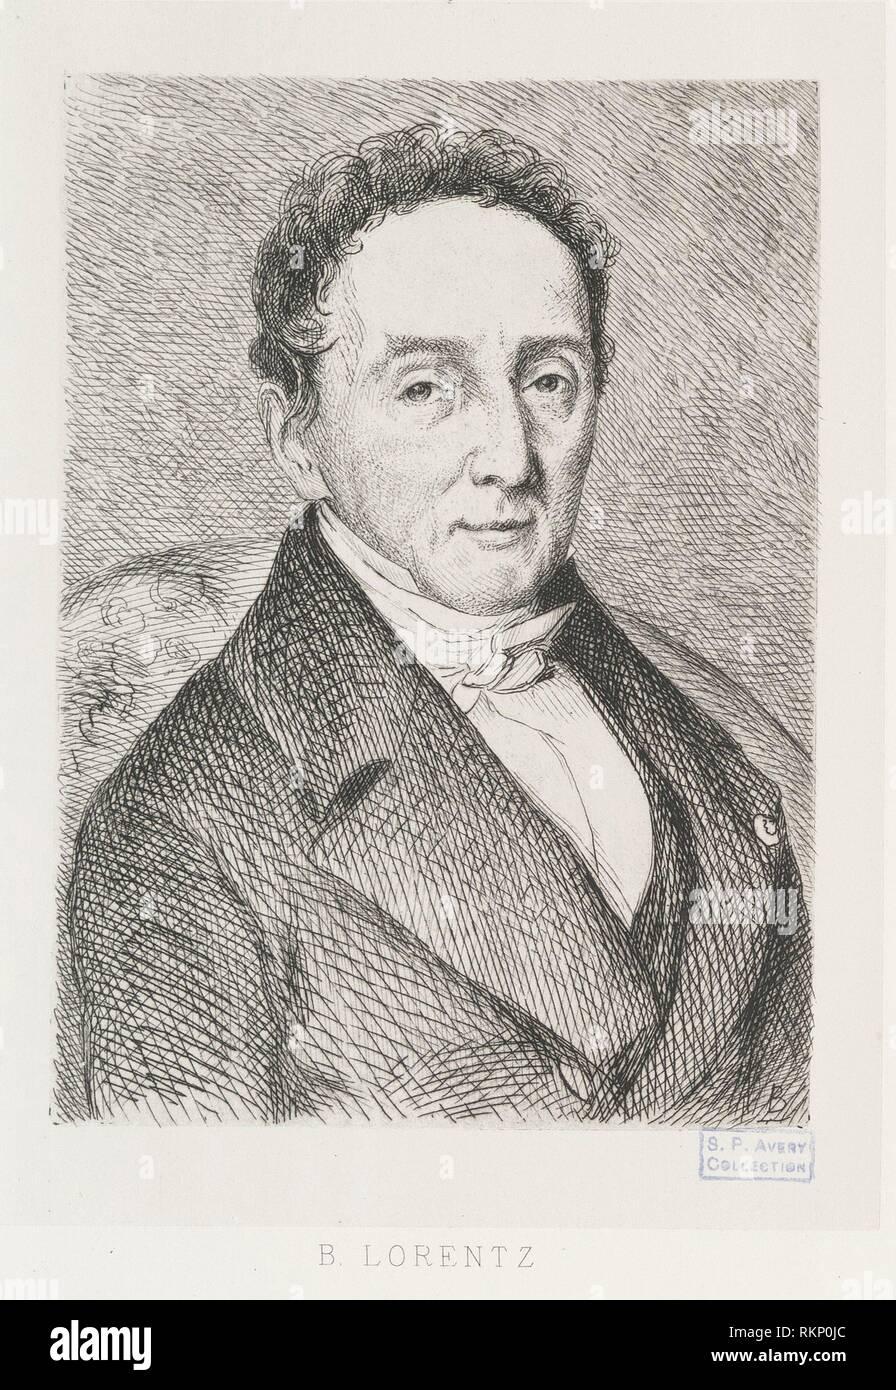 B. Lorentz. Avery, Samuel Putnam, 1822-1904 (Collector) Bracquemond, Félix (1833-1914) (Etcher). Samuel Putnam Avery Collection Bracquemond, Félix - Stock Image